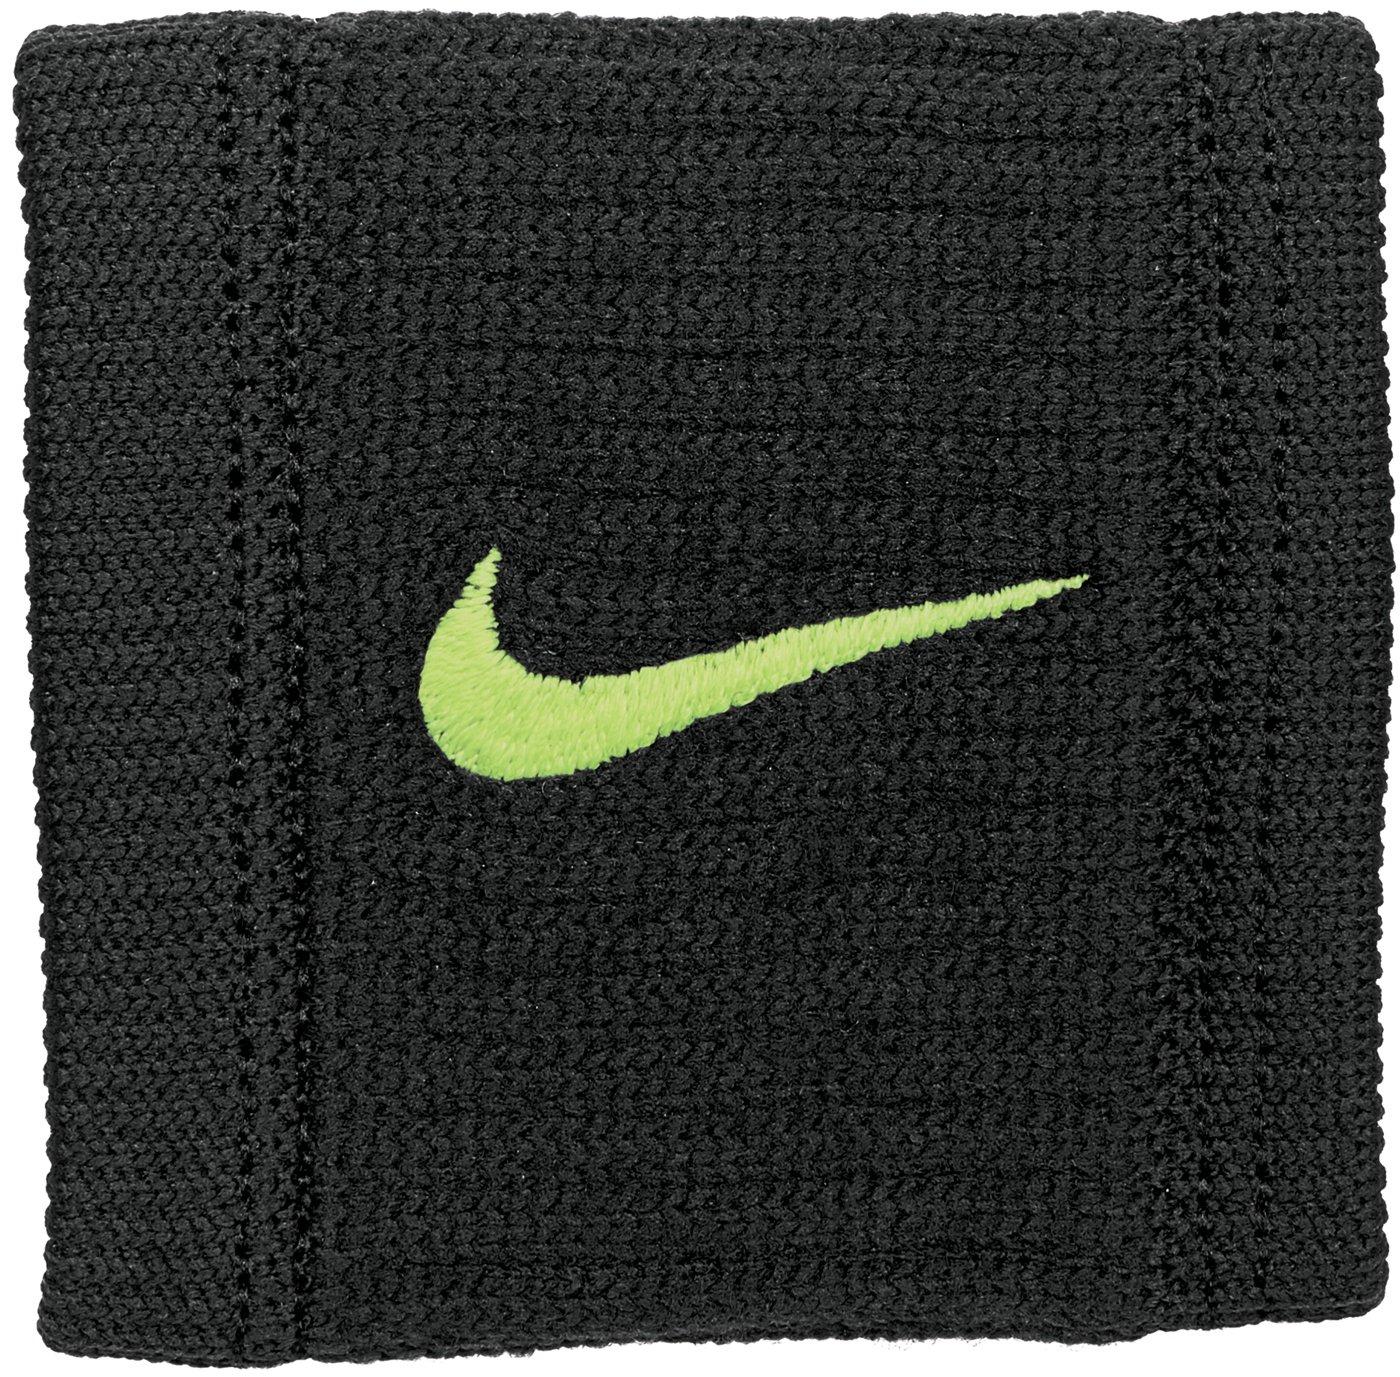 Coppia Polsini Tennis Nike Dri Dry Reveal Tergisudore più colori Federer Nadal (Black/Volt/Volt) N.NN.J0.085.OS